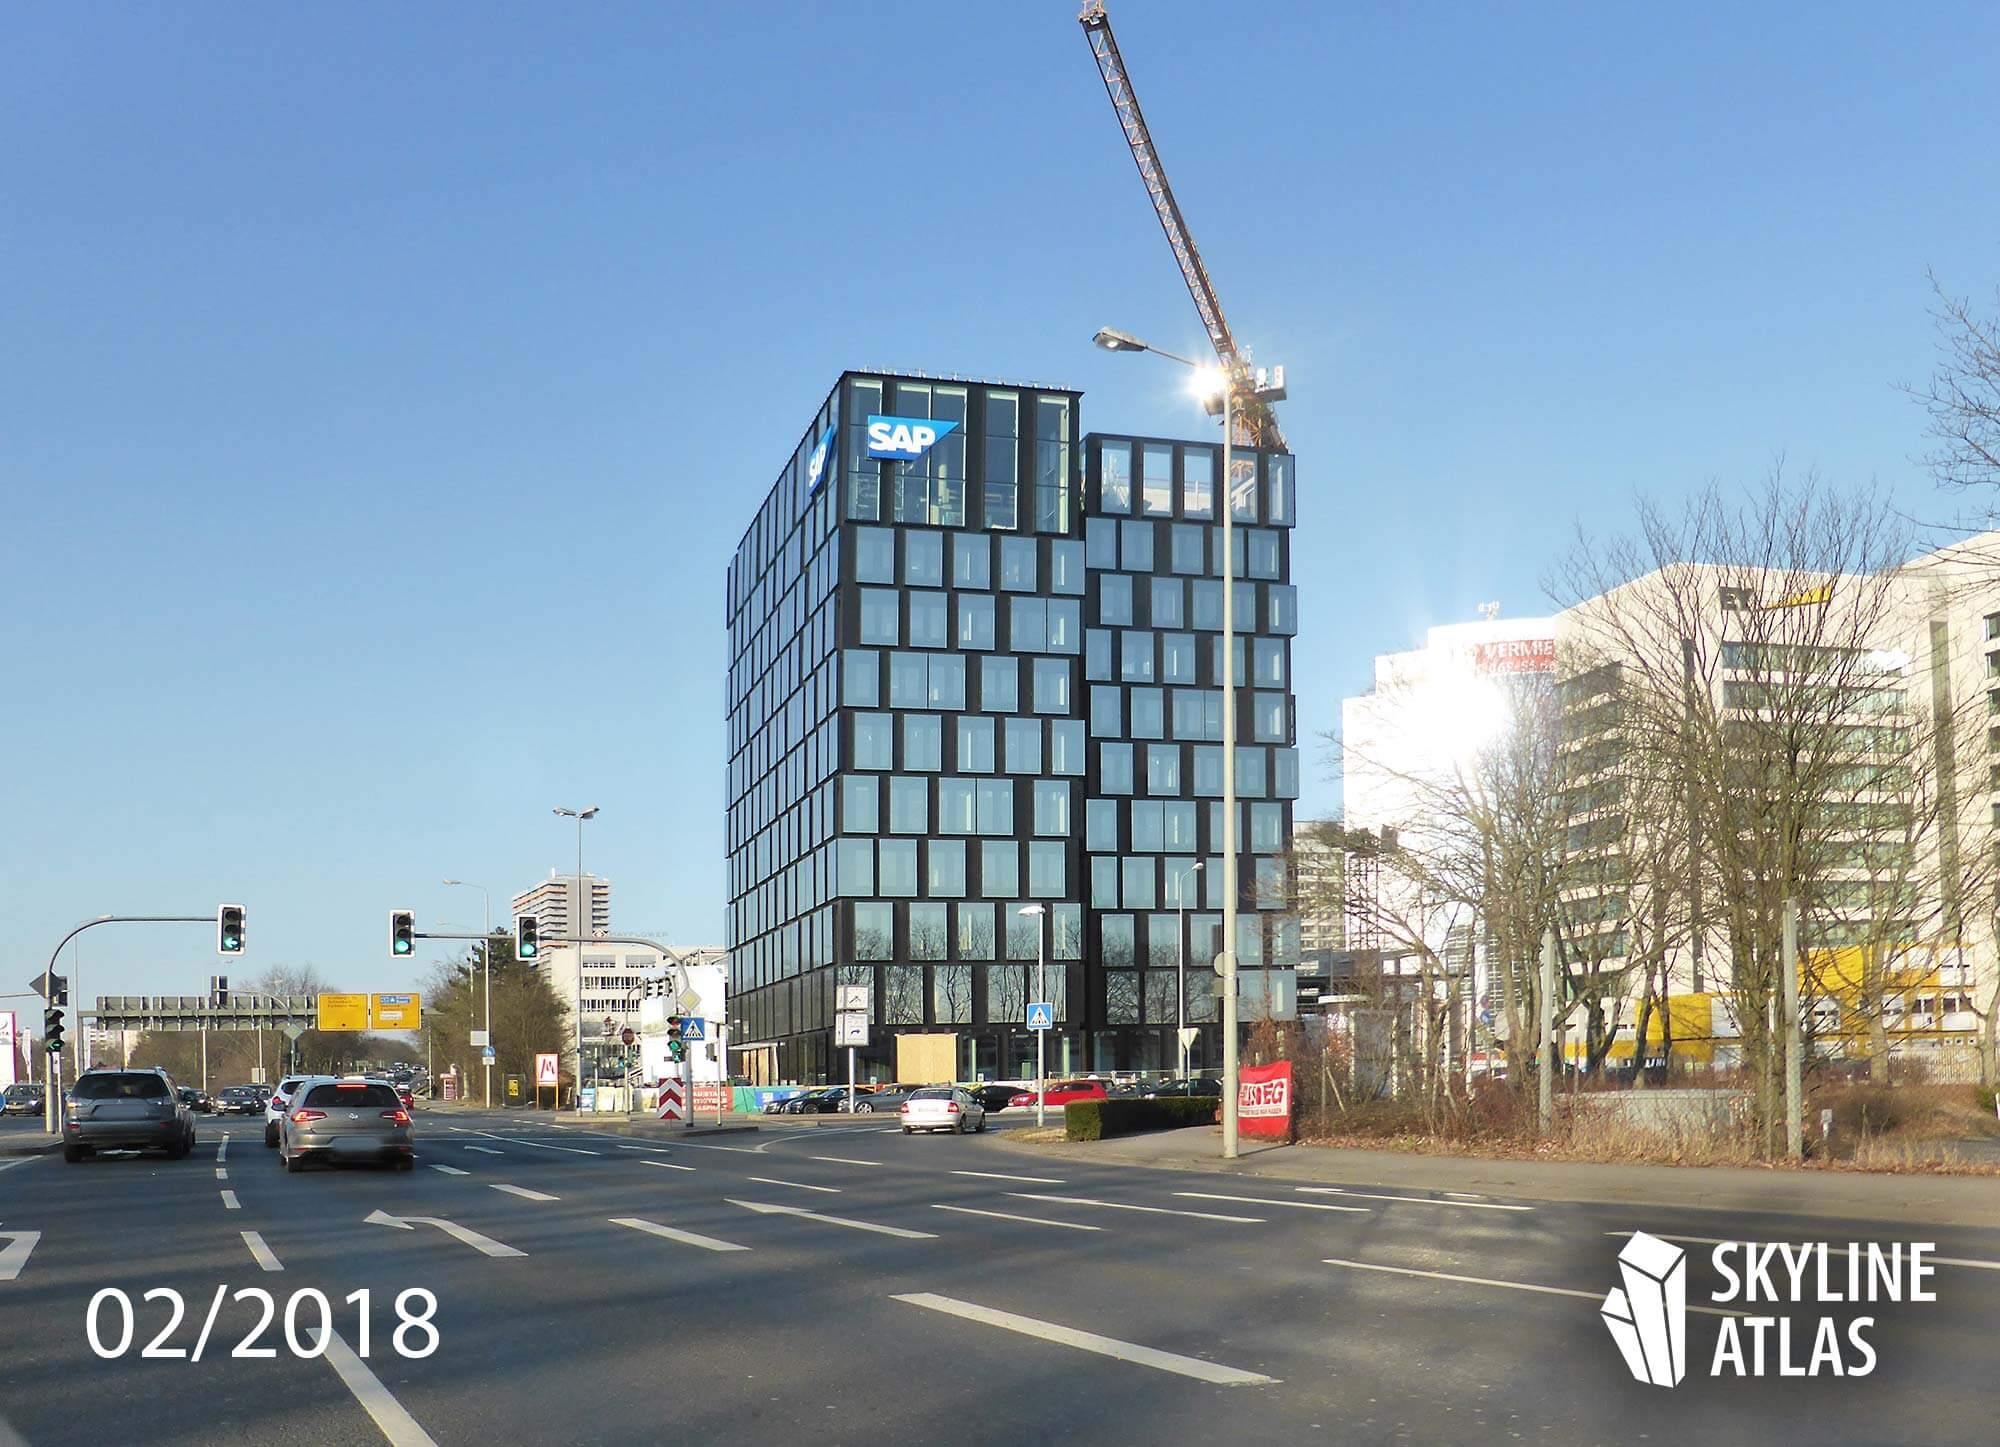 SAP Niederlassung Rhein-Main Eschborn Frankfurt - Februar 2018